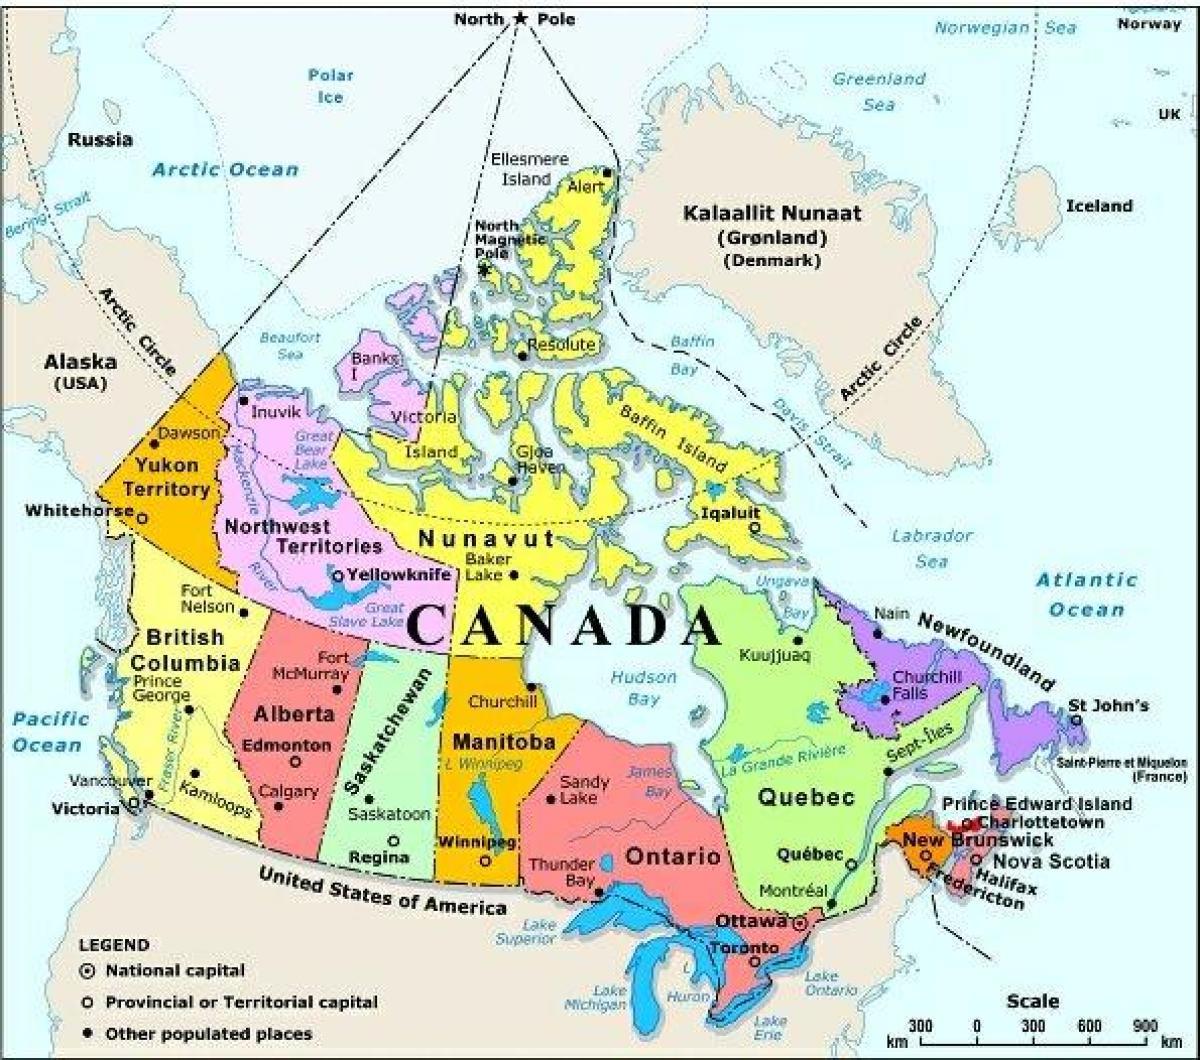 Lansi Kanadan Kartta Jossa Kaupungit Kartta Lansi Kanadan